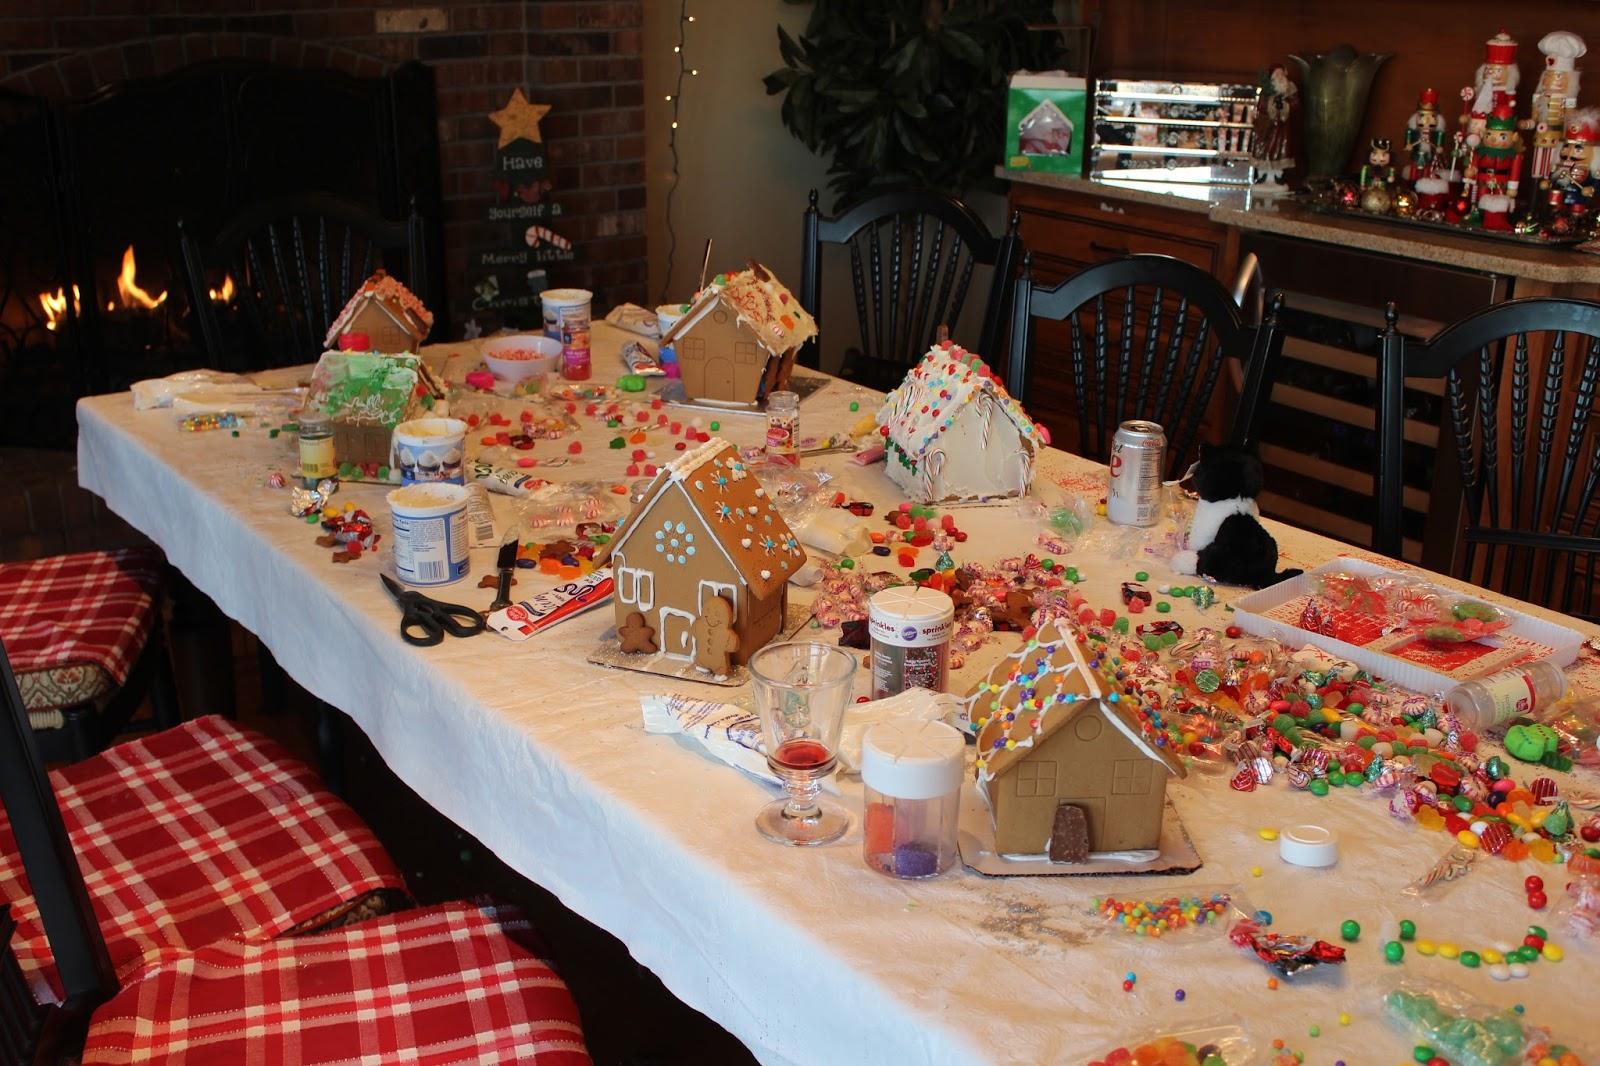 Tice 39 S Tidbits Getting Festive Decorating Gingerbread